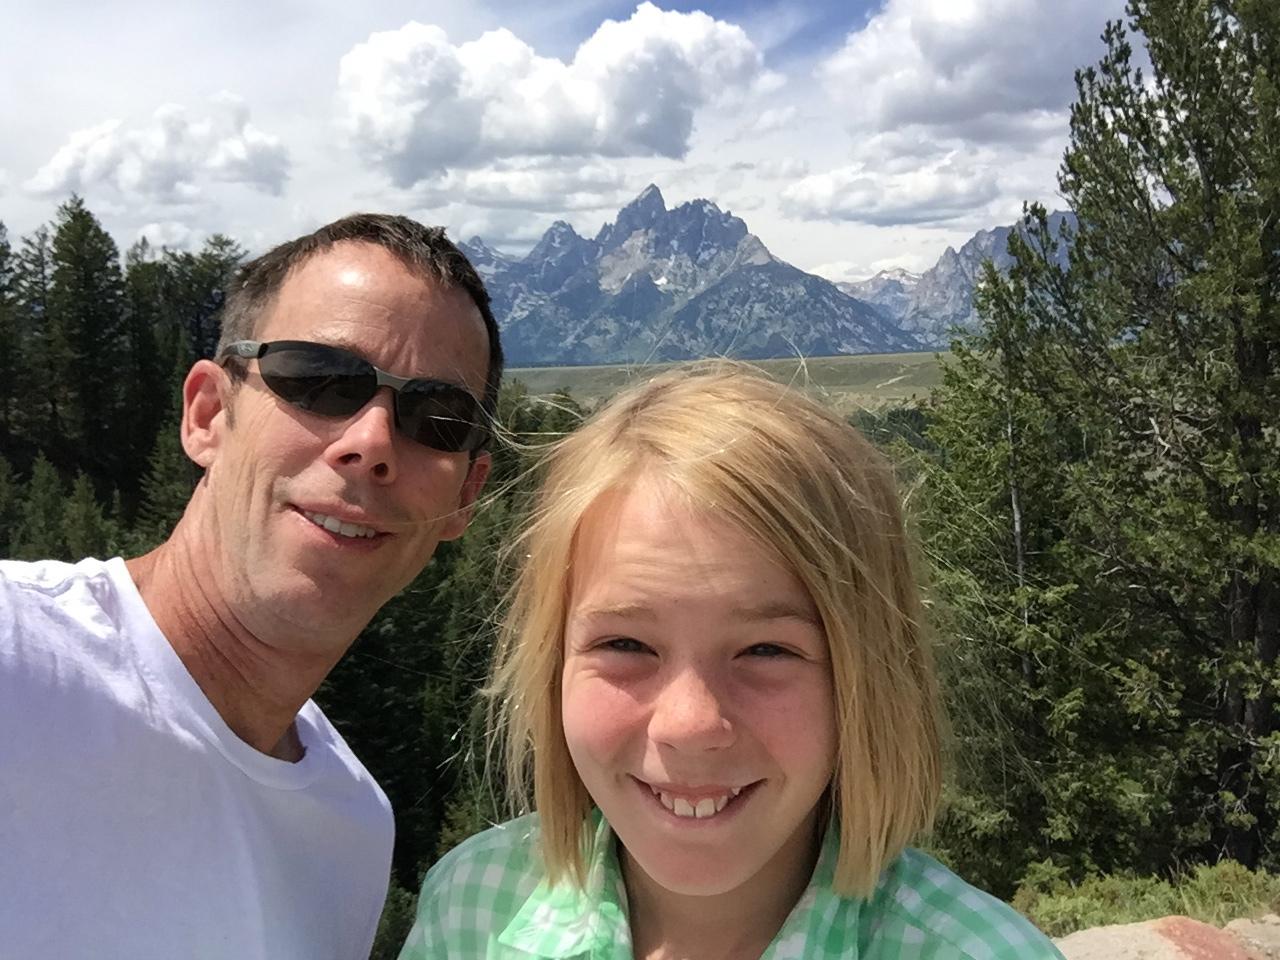 Finn and I photobombing the Grand Tetons National Park